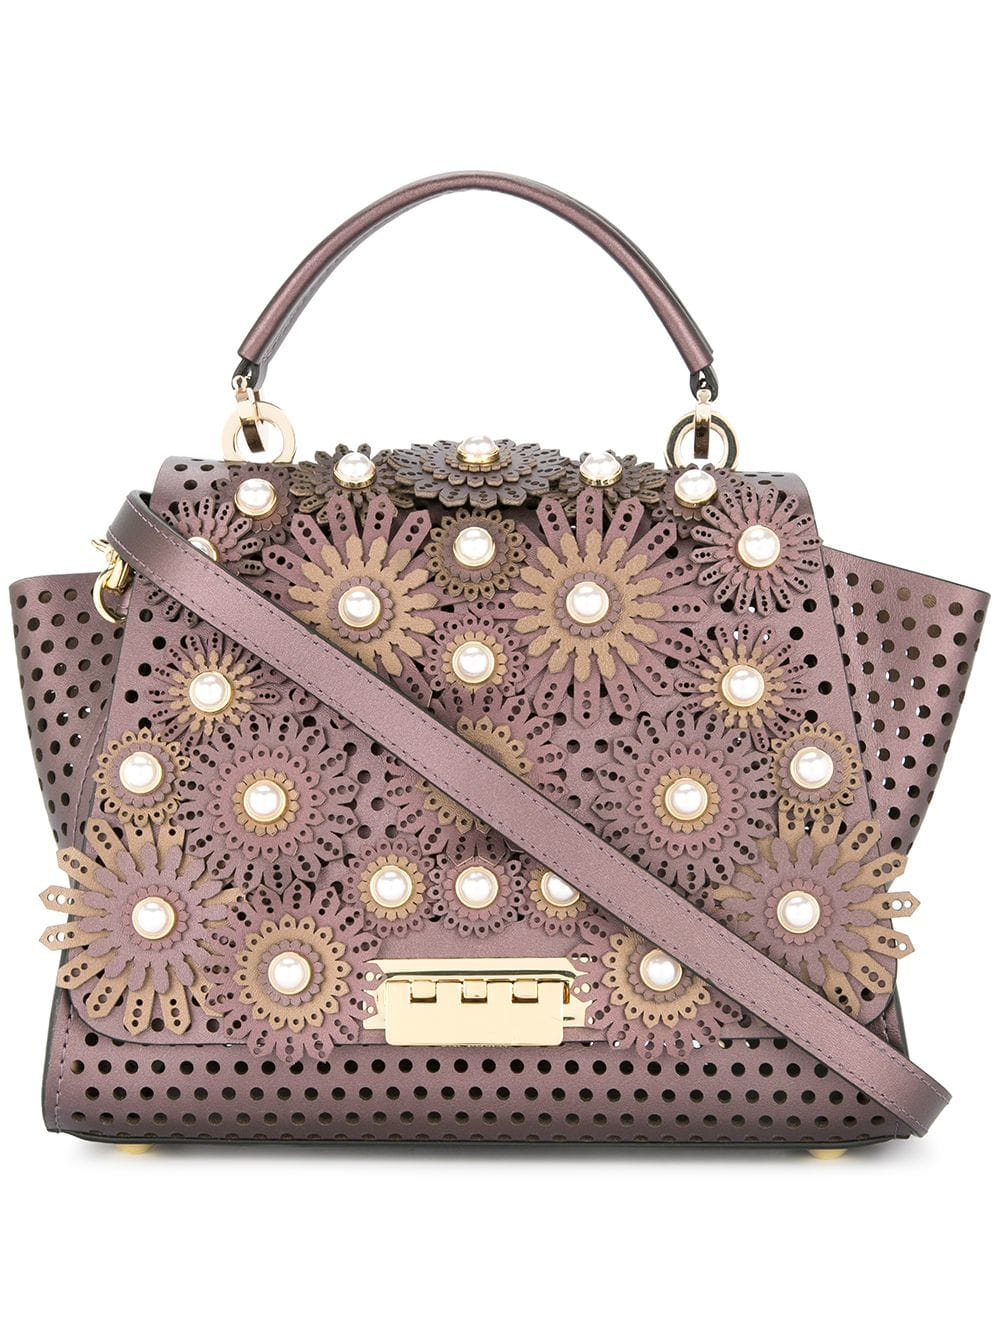 Zac Zac Posen 'Eartha' Handtasche mit Blumenapplikation - Rosa